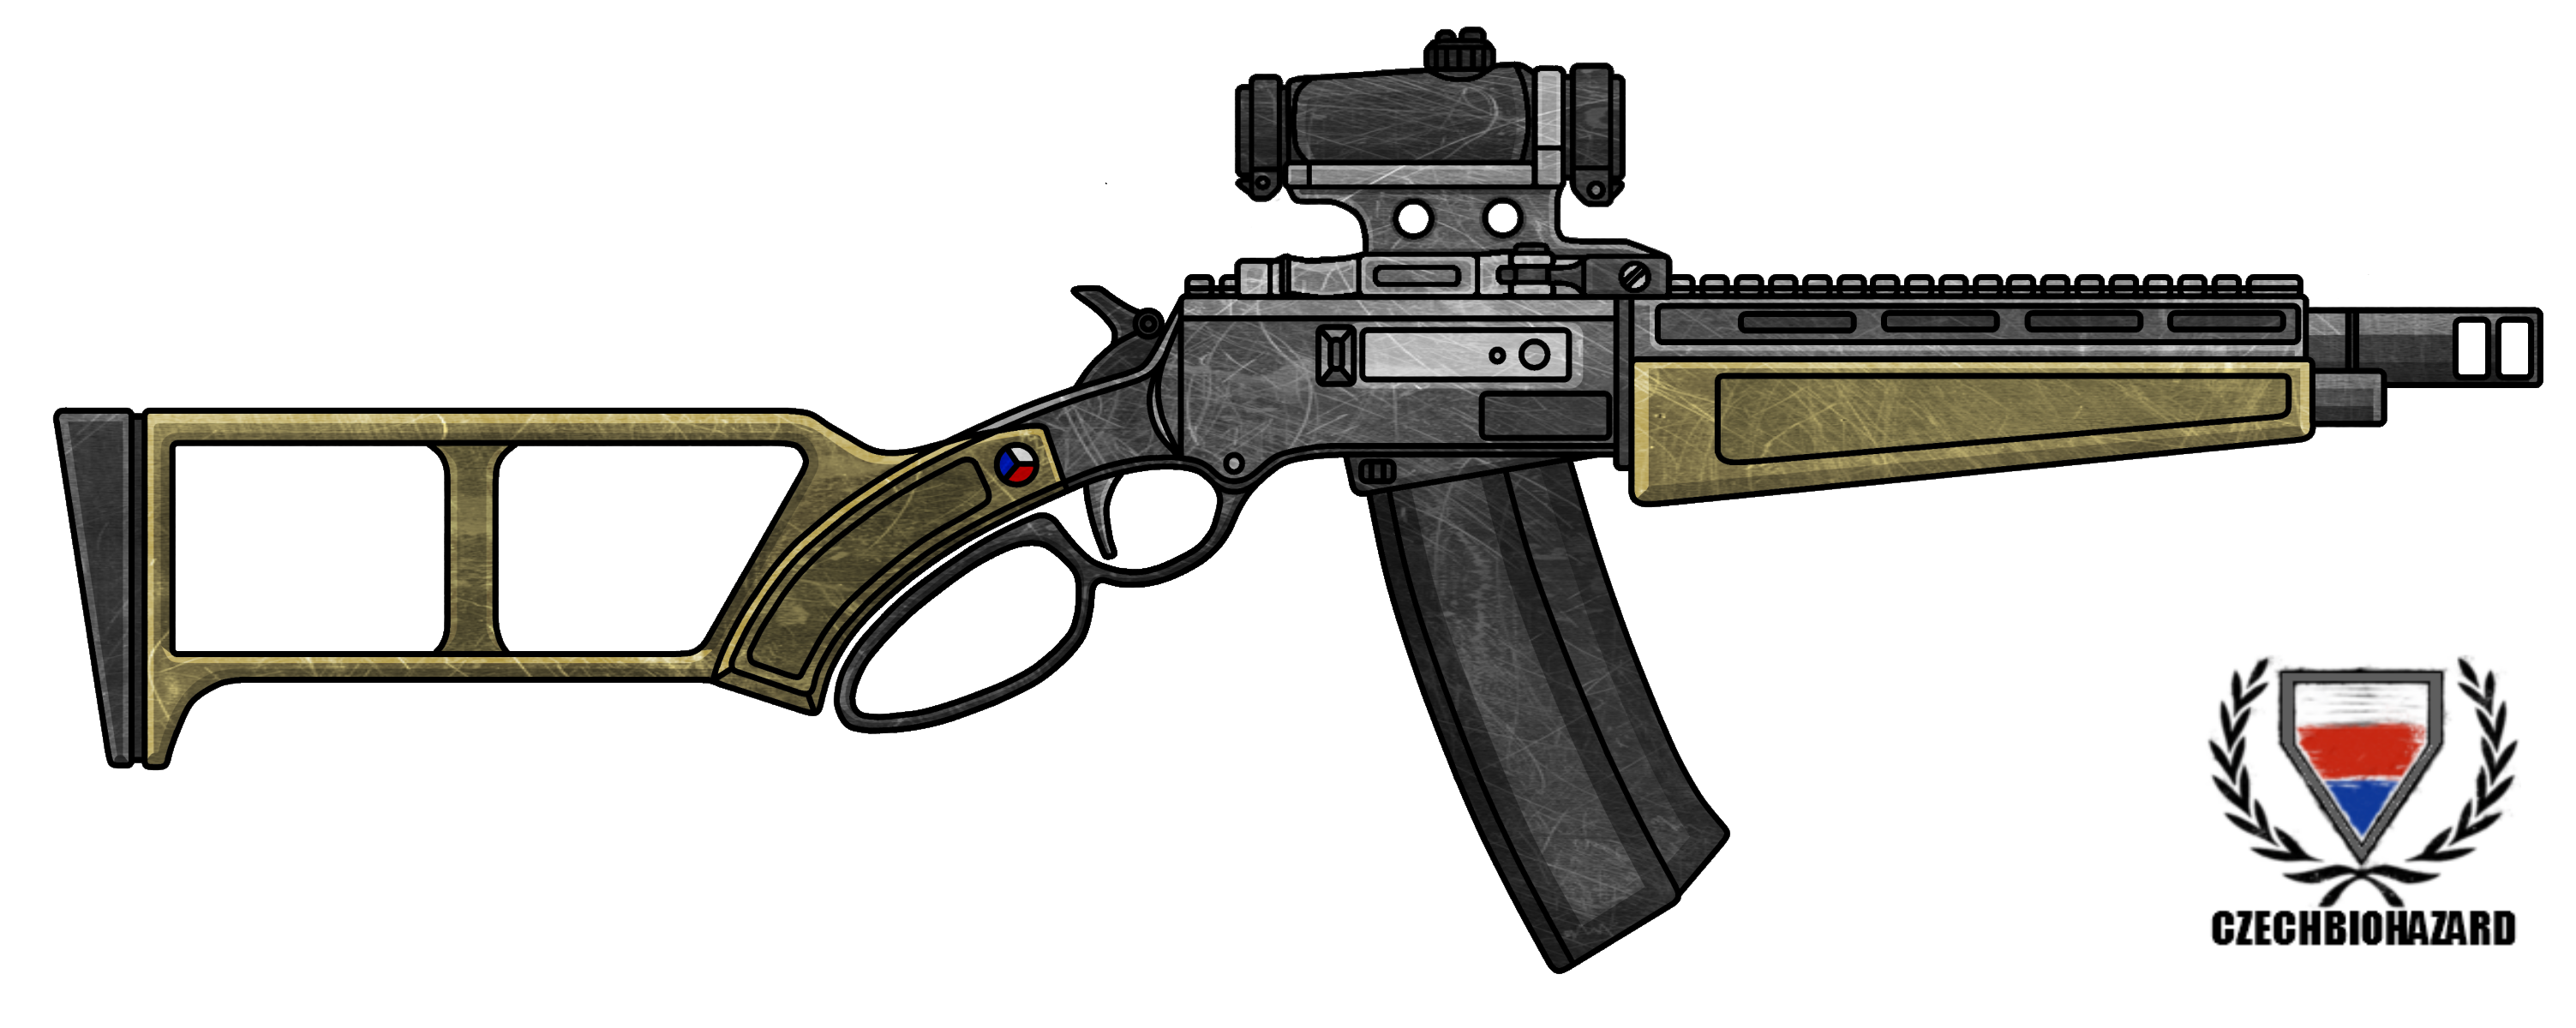 Fictional Firearm: HC-308 Lever-Action Rifle by CzechBiohazard